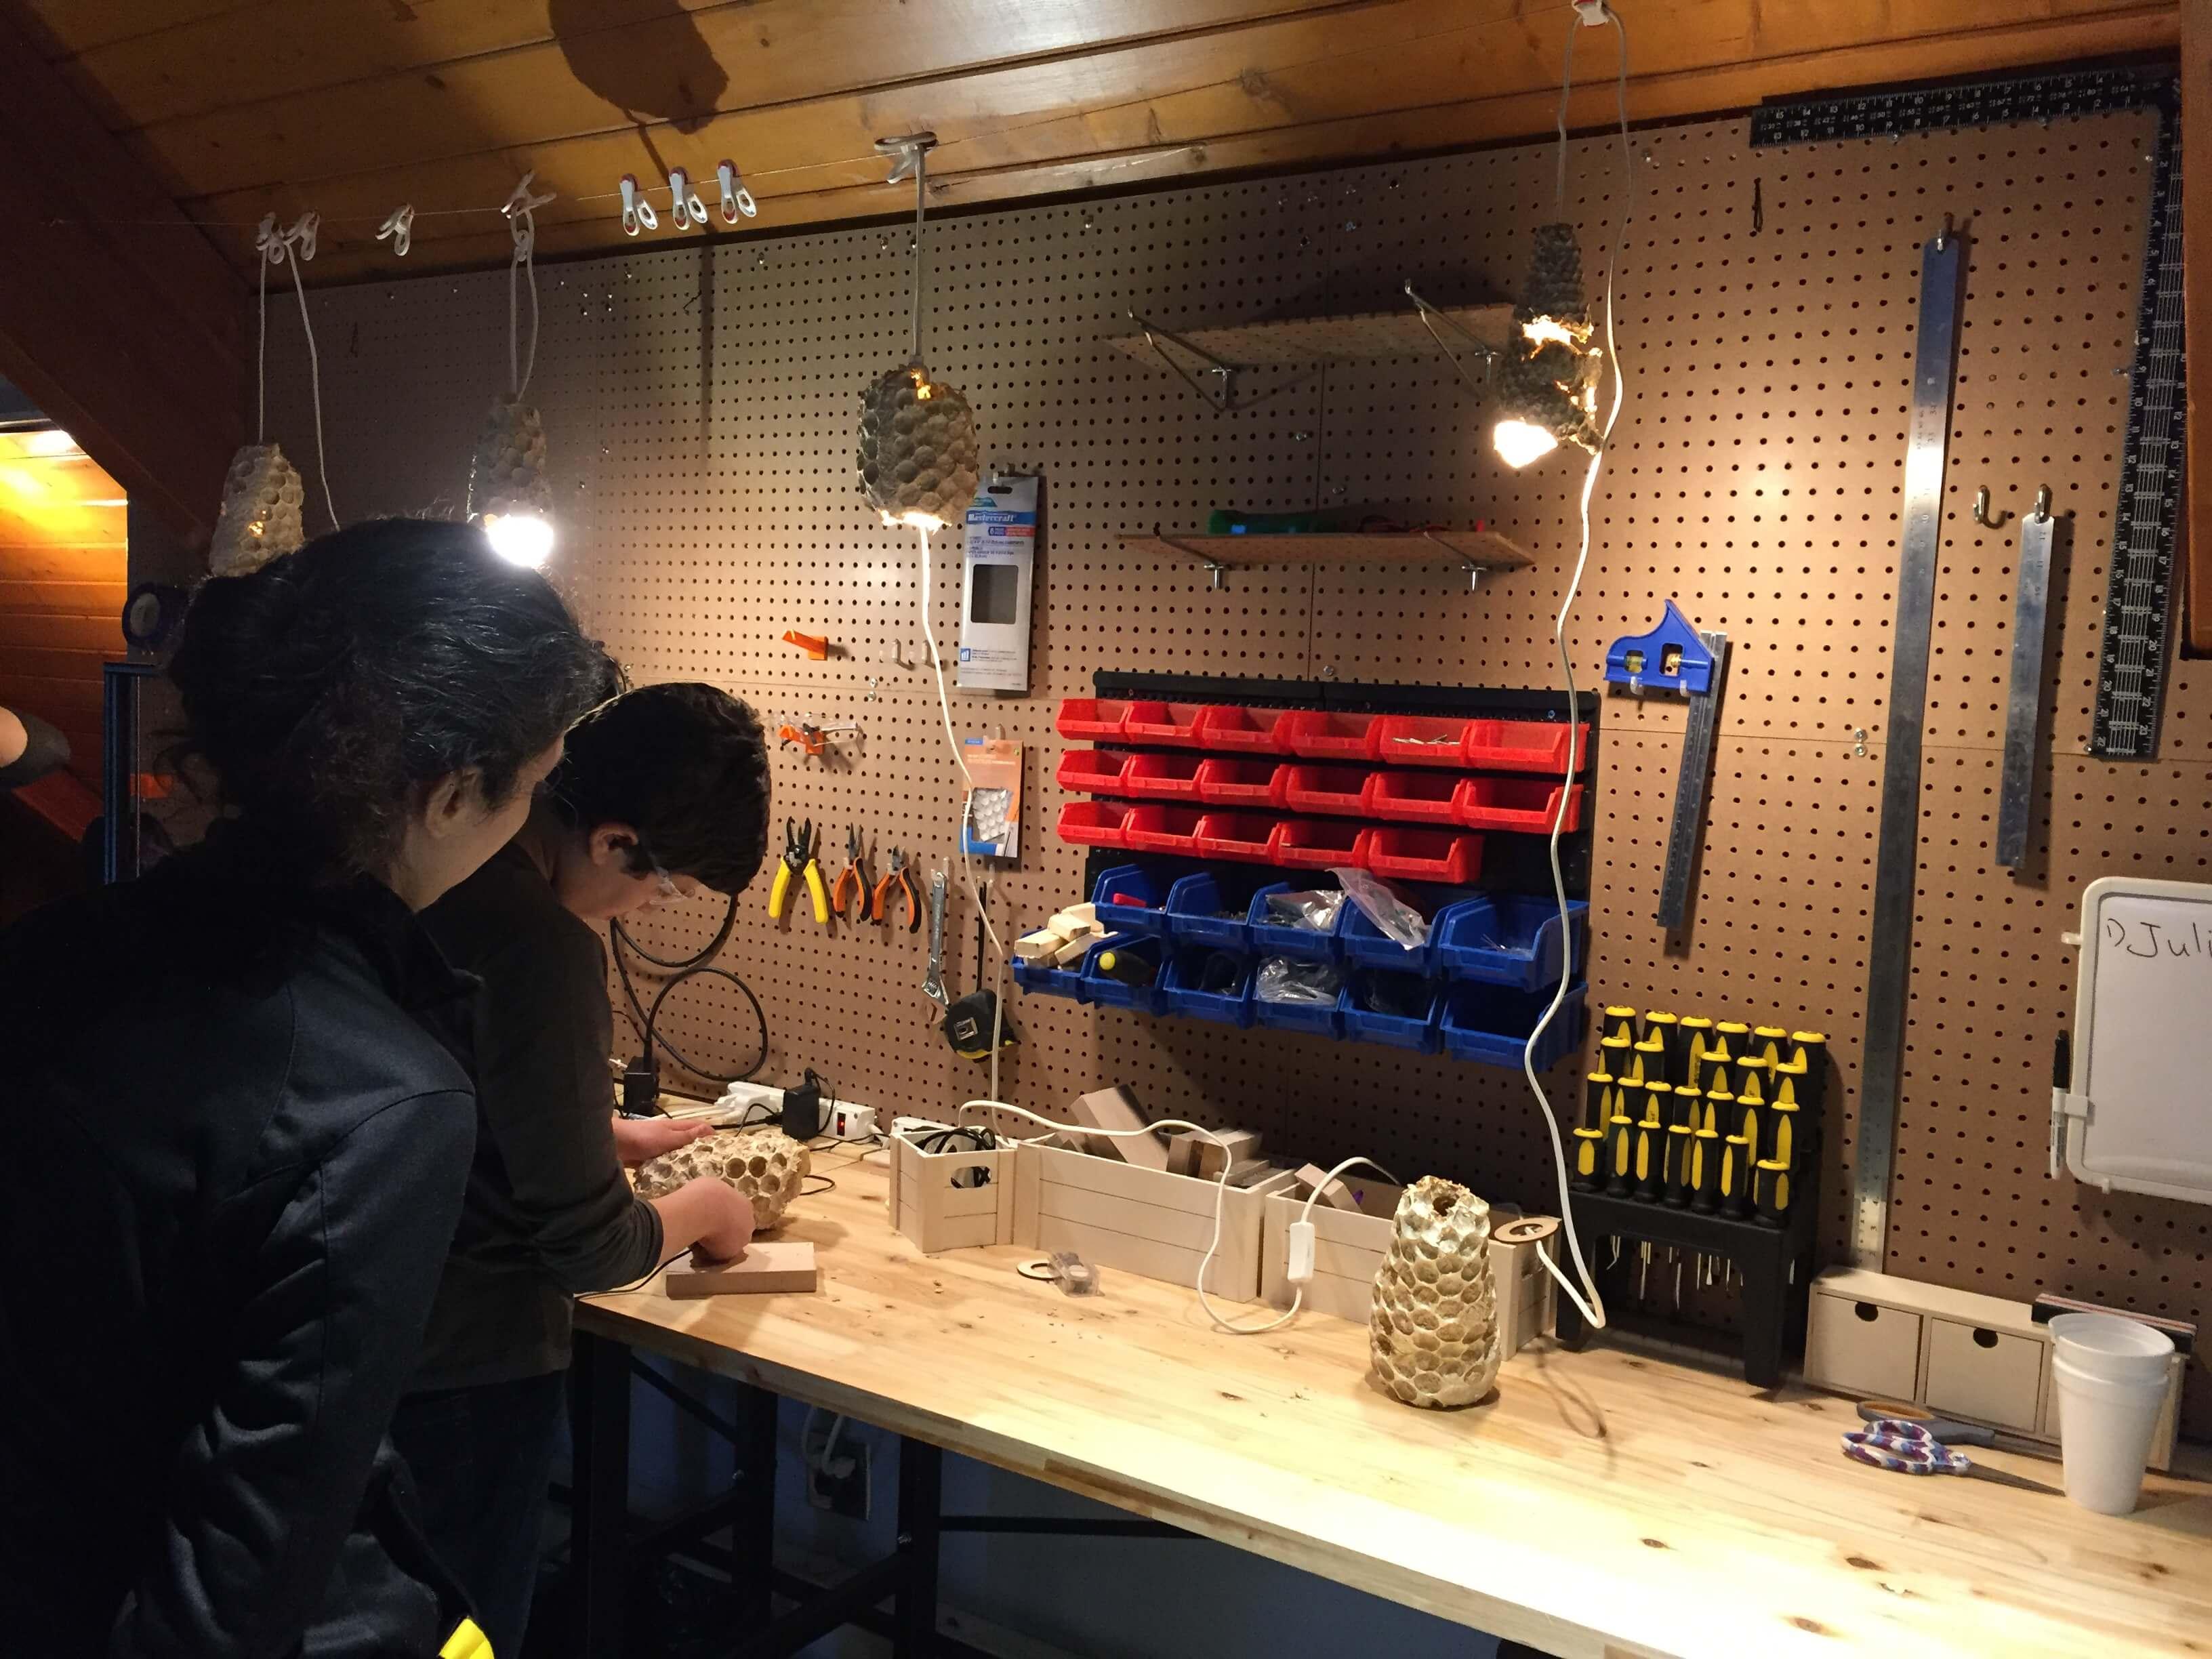 Mycelium lampshades being adjusted